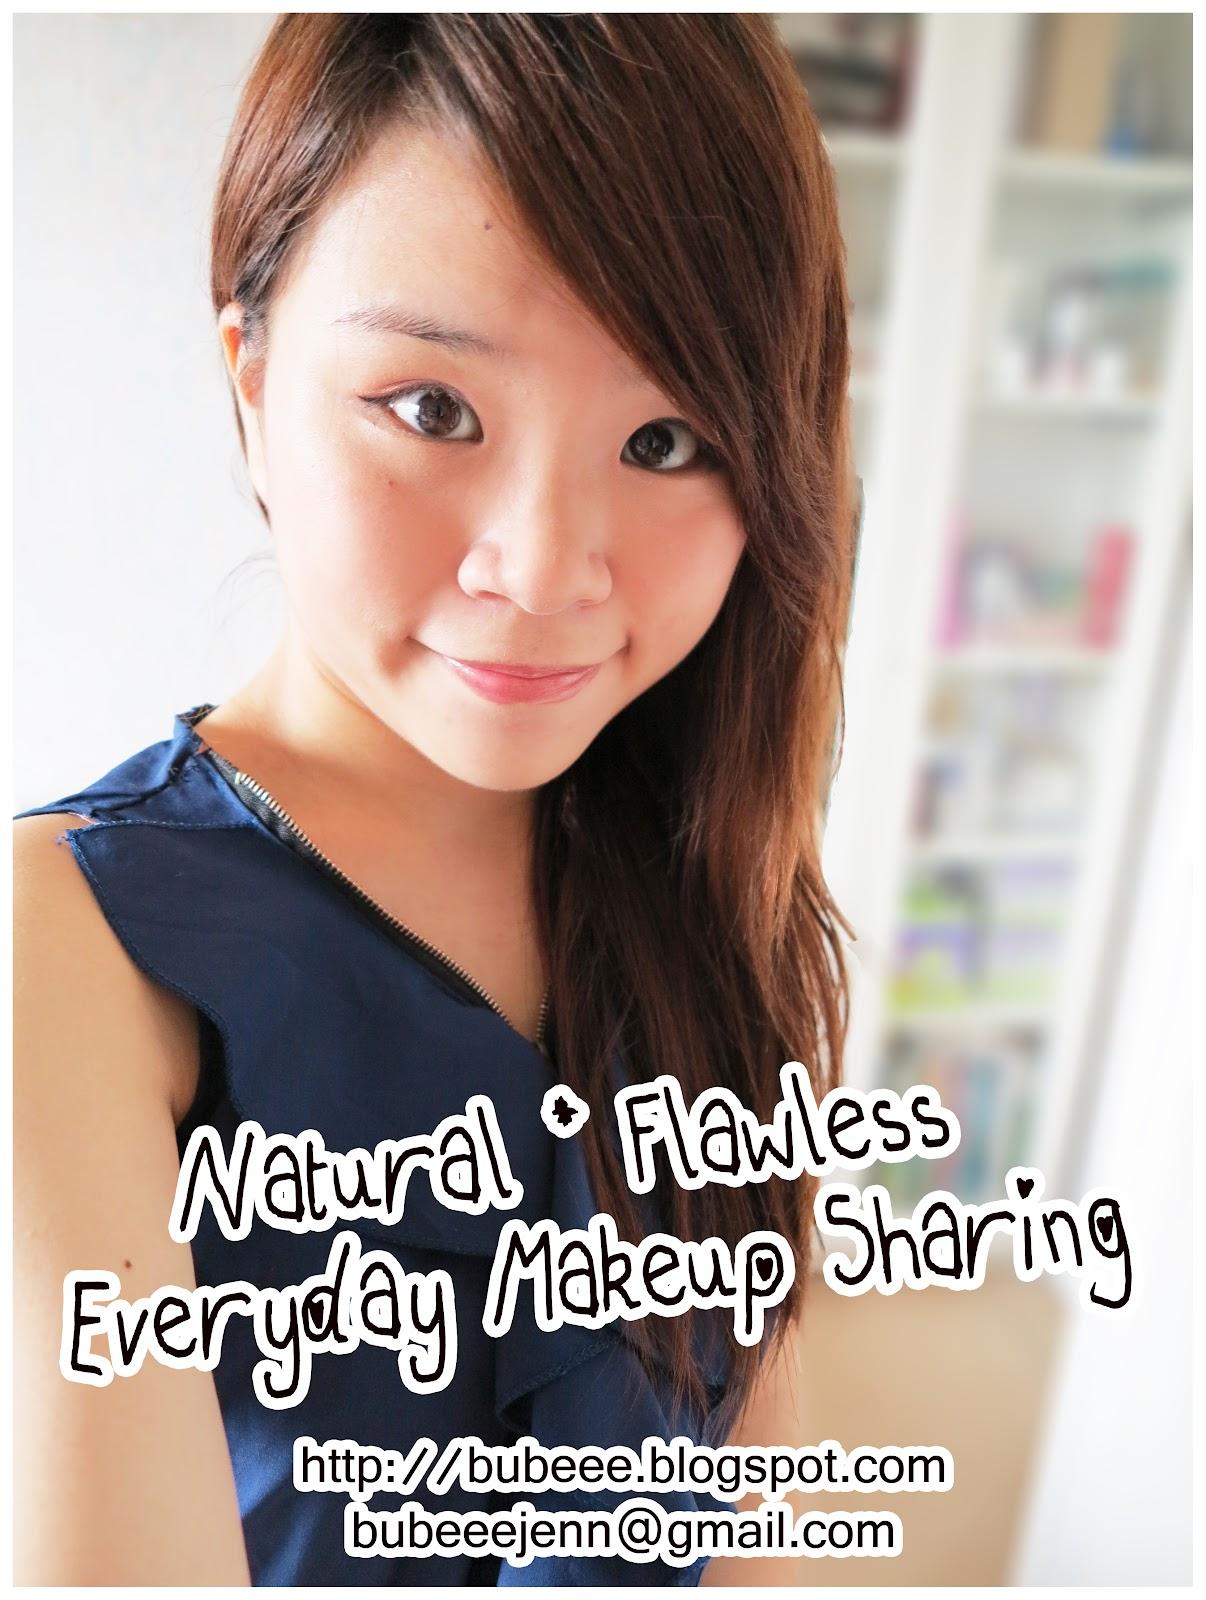 Bubeee. ♥: Natural * Flawless Everyday Makeup Sharing